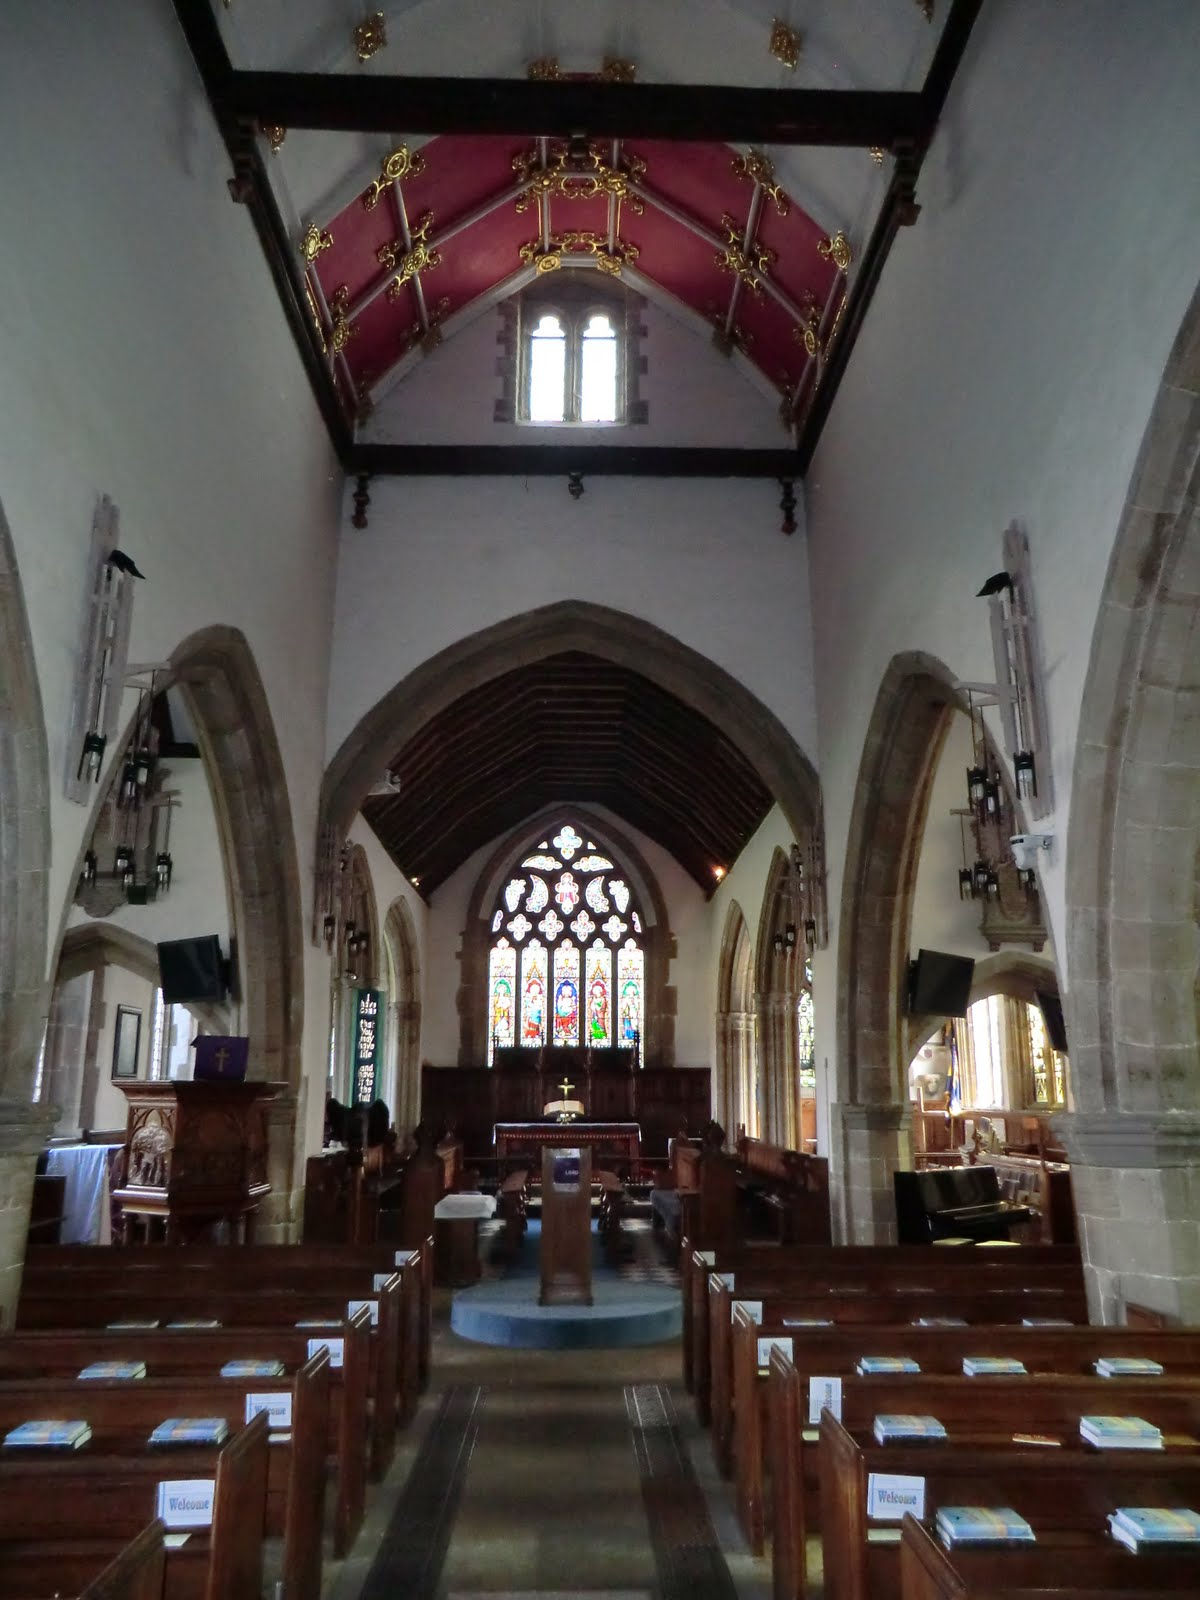 CIMG1871 All Saints church, Lindfield